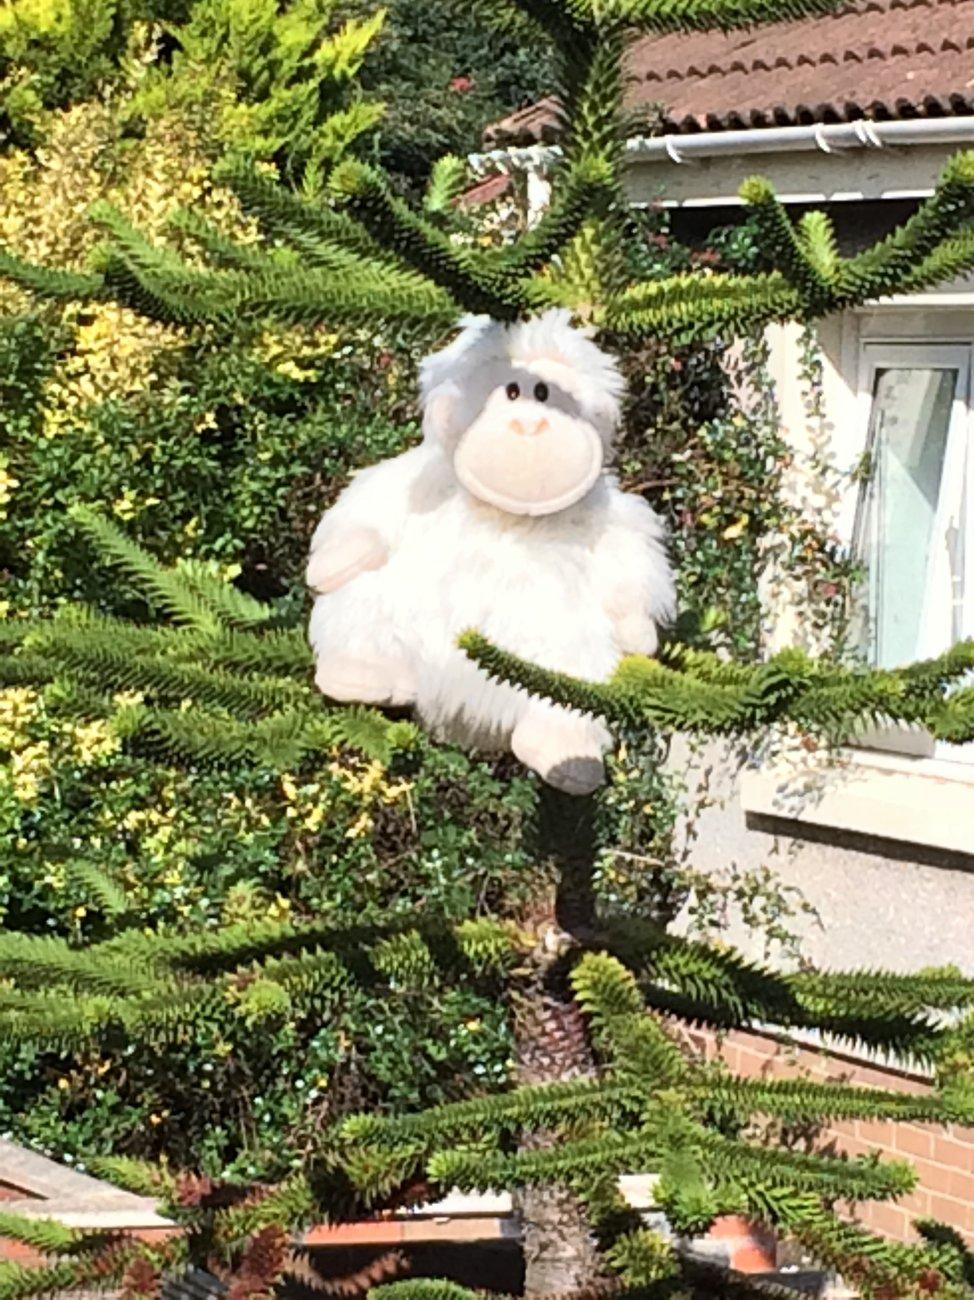 # White Gorilla